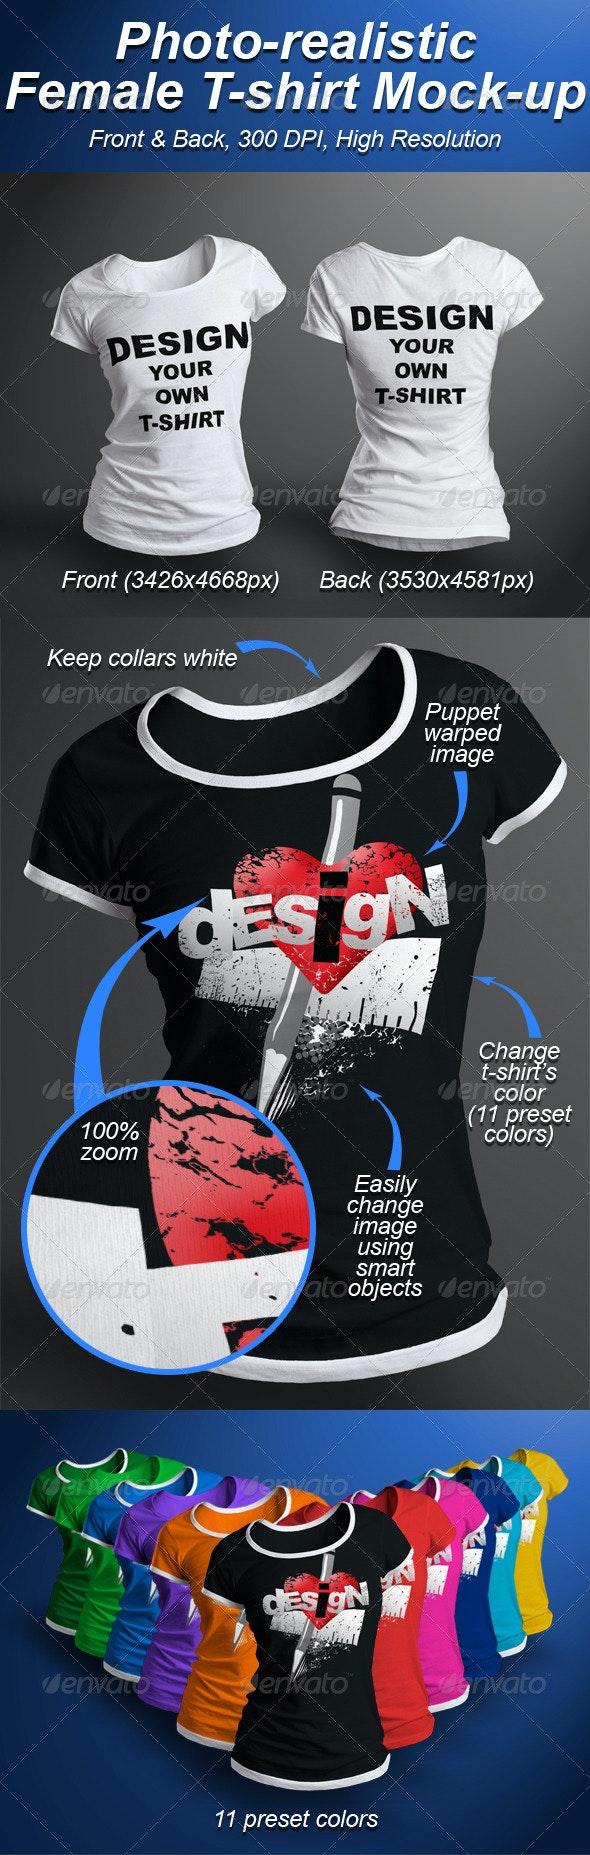 Female T-shirt Mock-up Photorealistic 3D Look - T-shirts Apparel